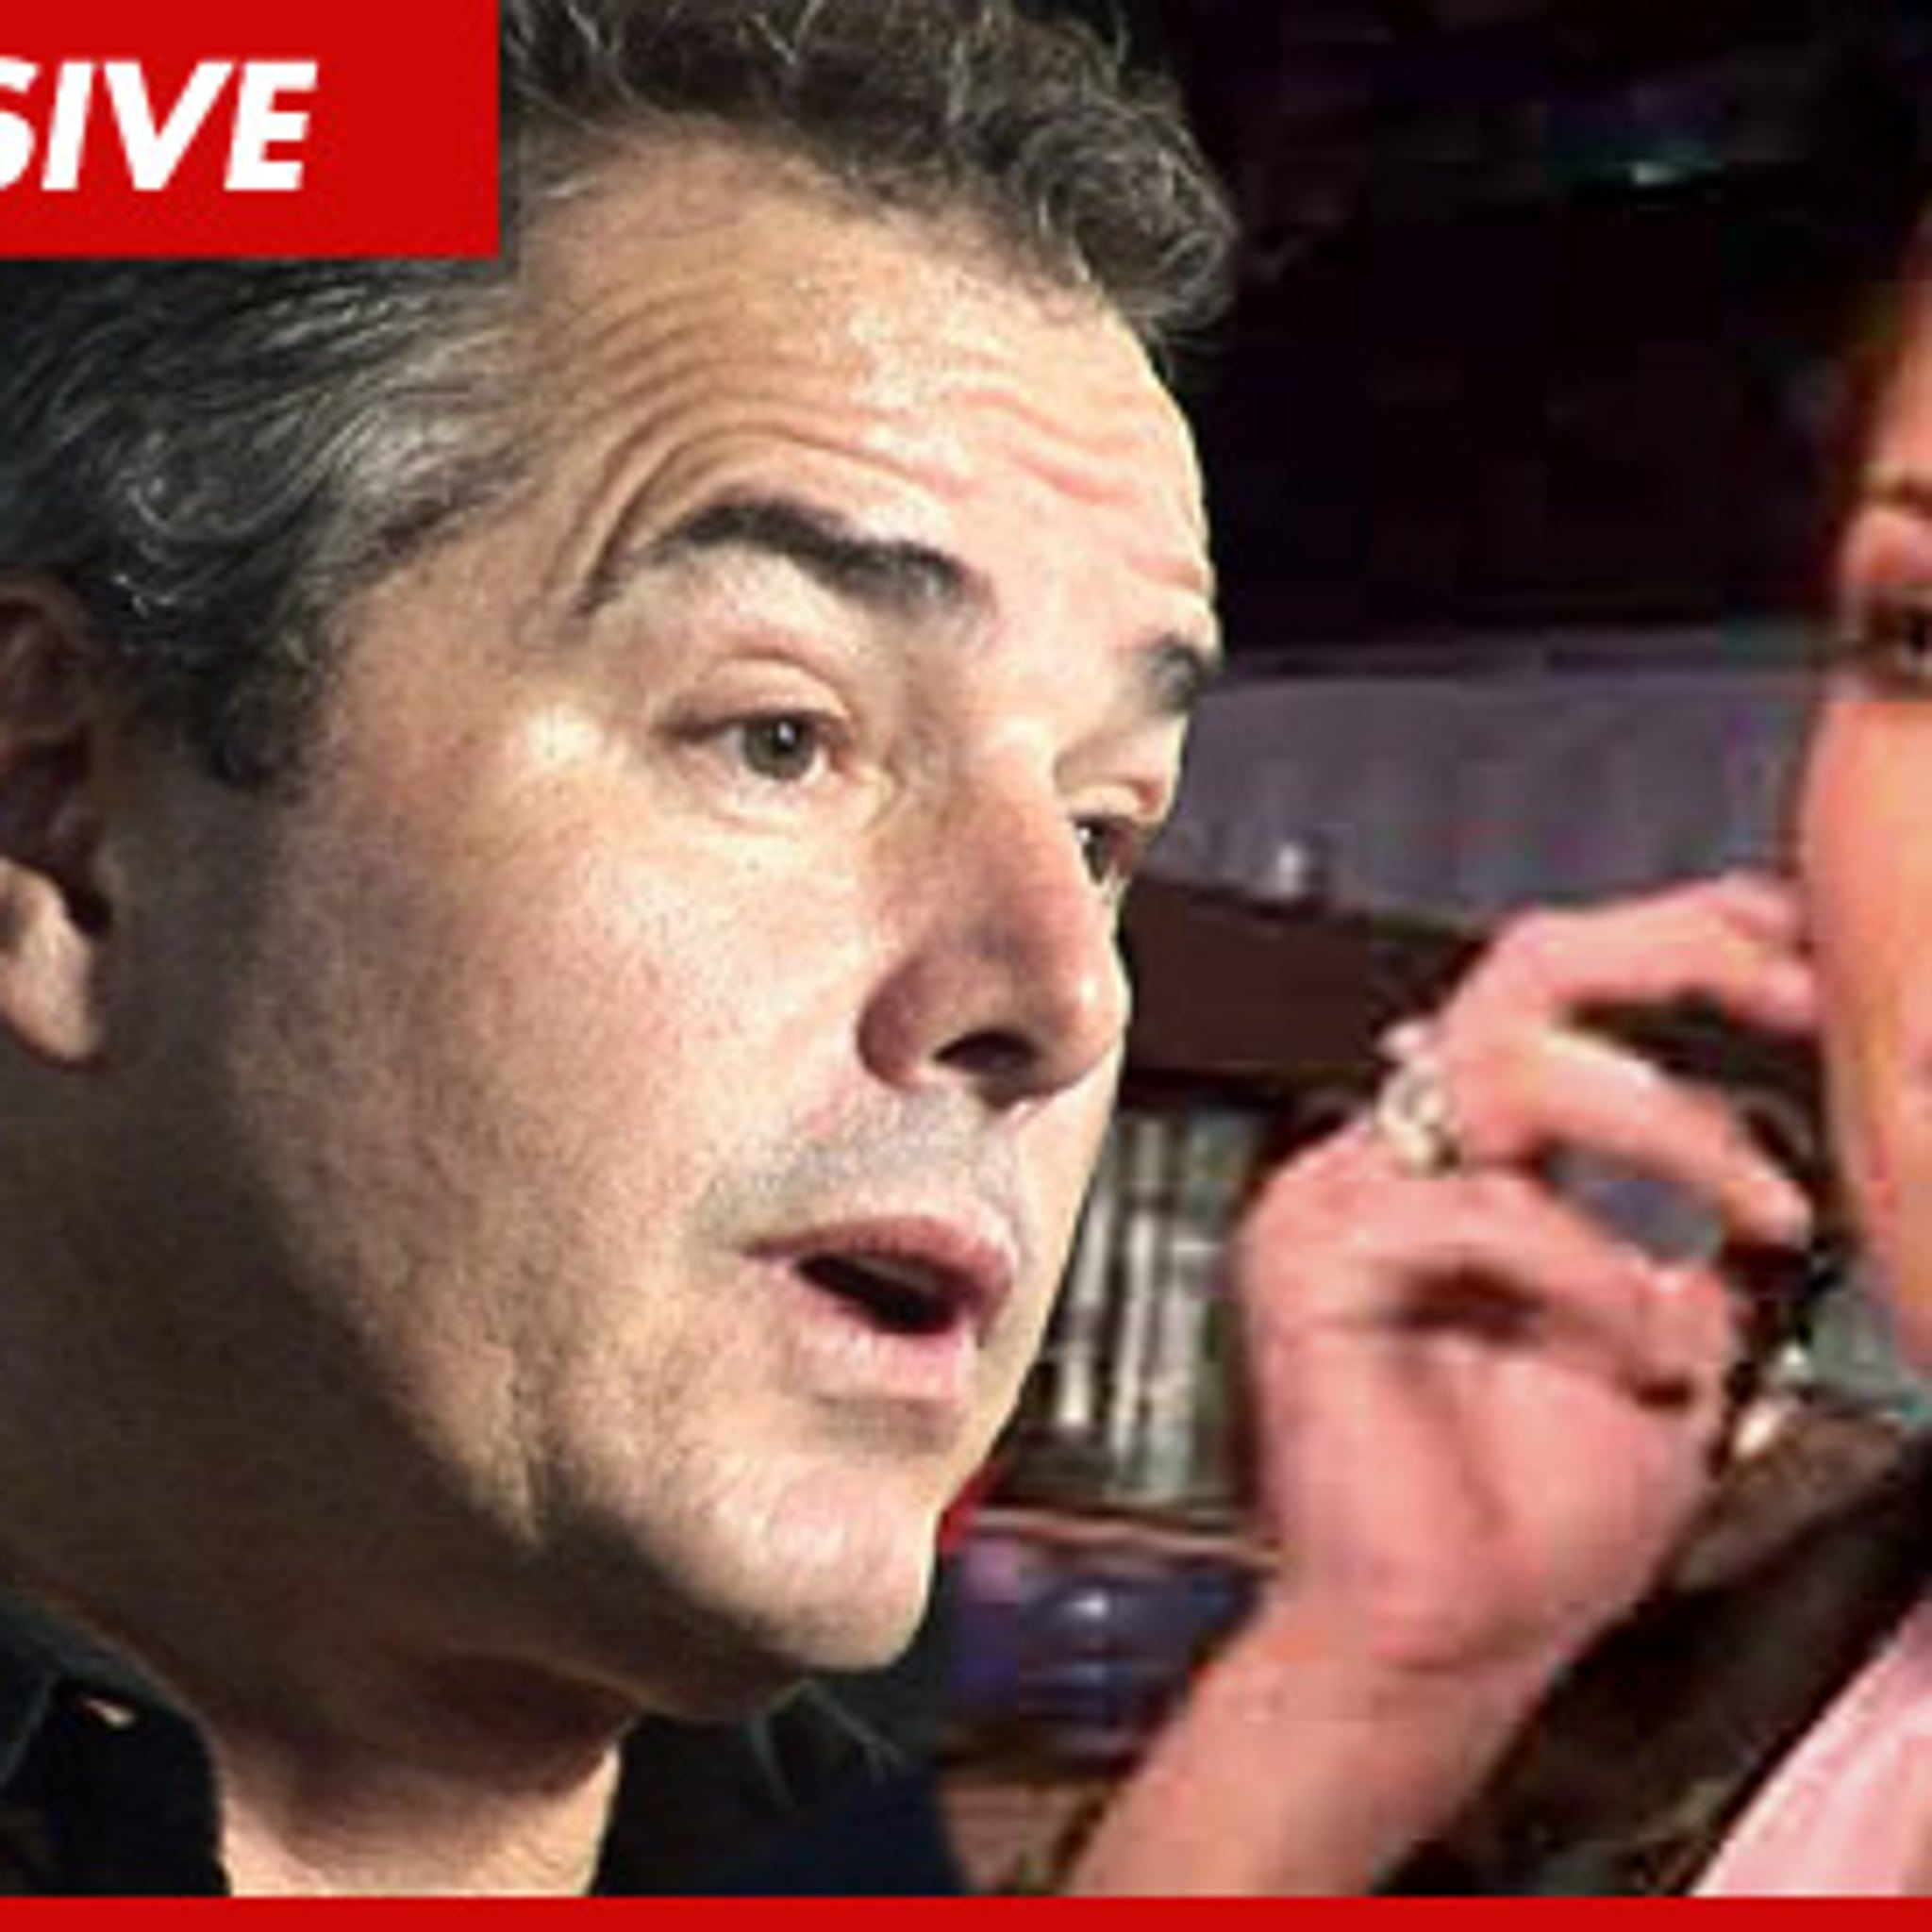 Christopher Knight Files for a Very Brady Divorce